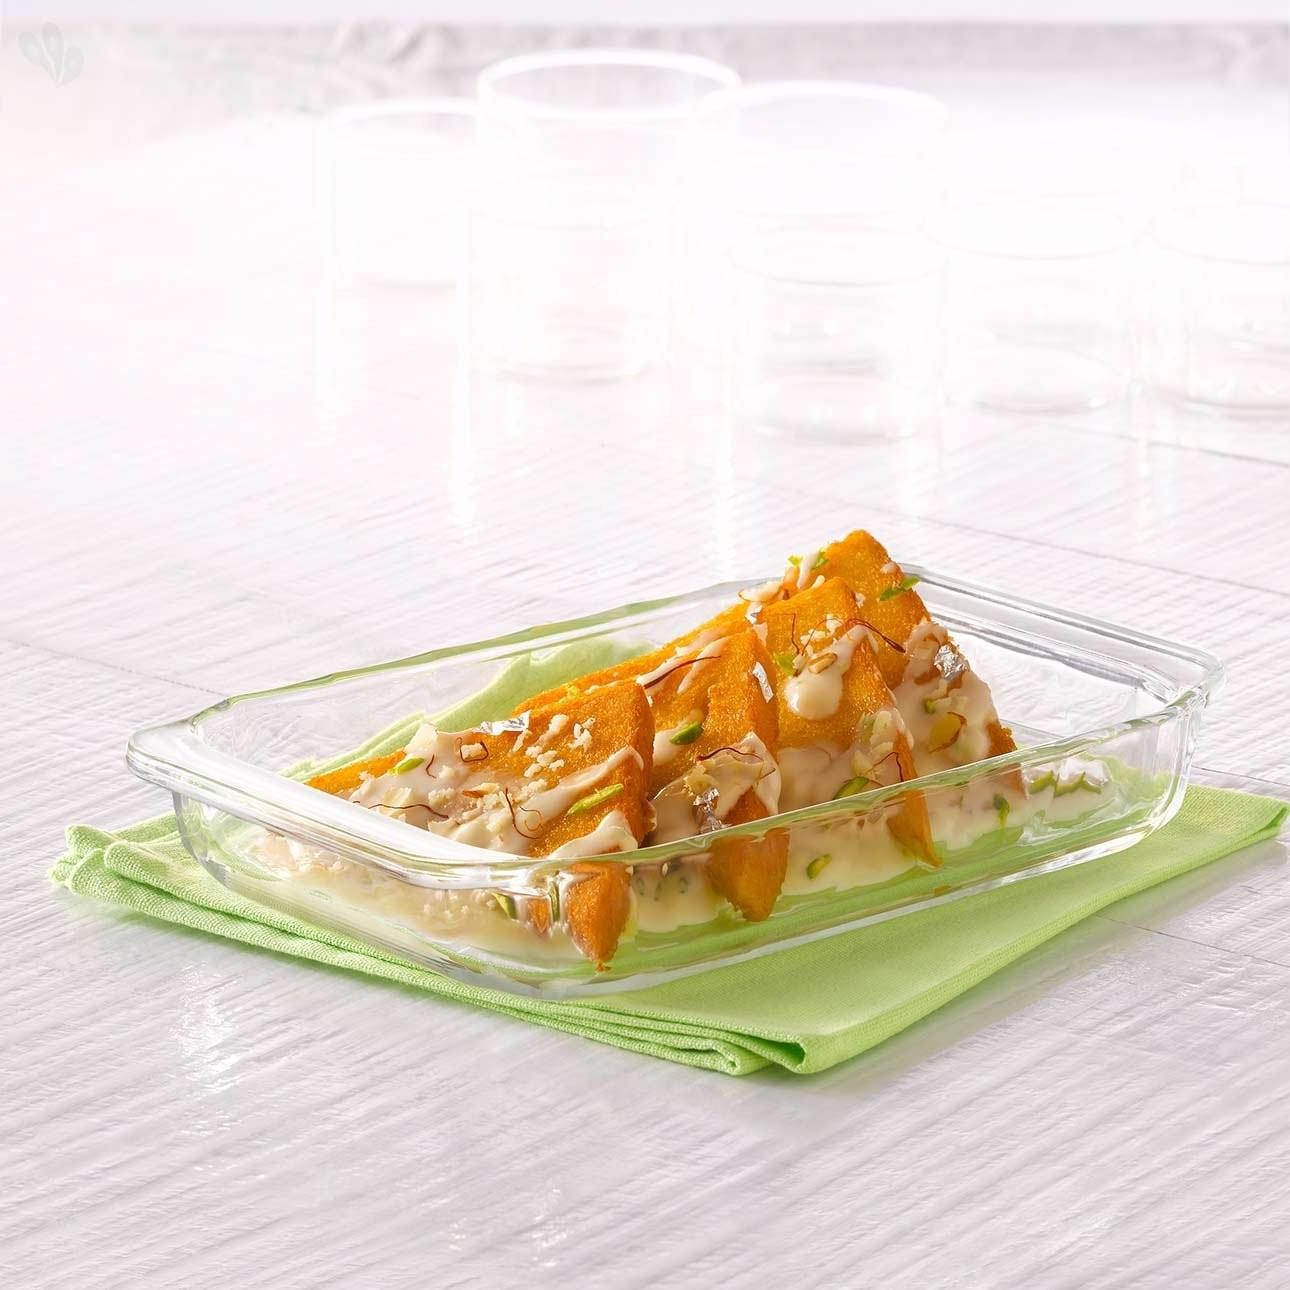 Borosil Rectangular Dish, 1.5 Litres